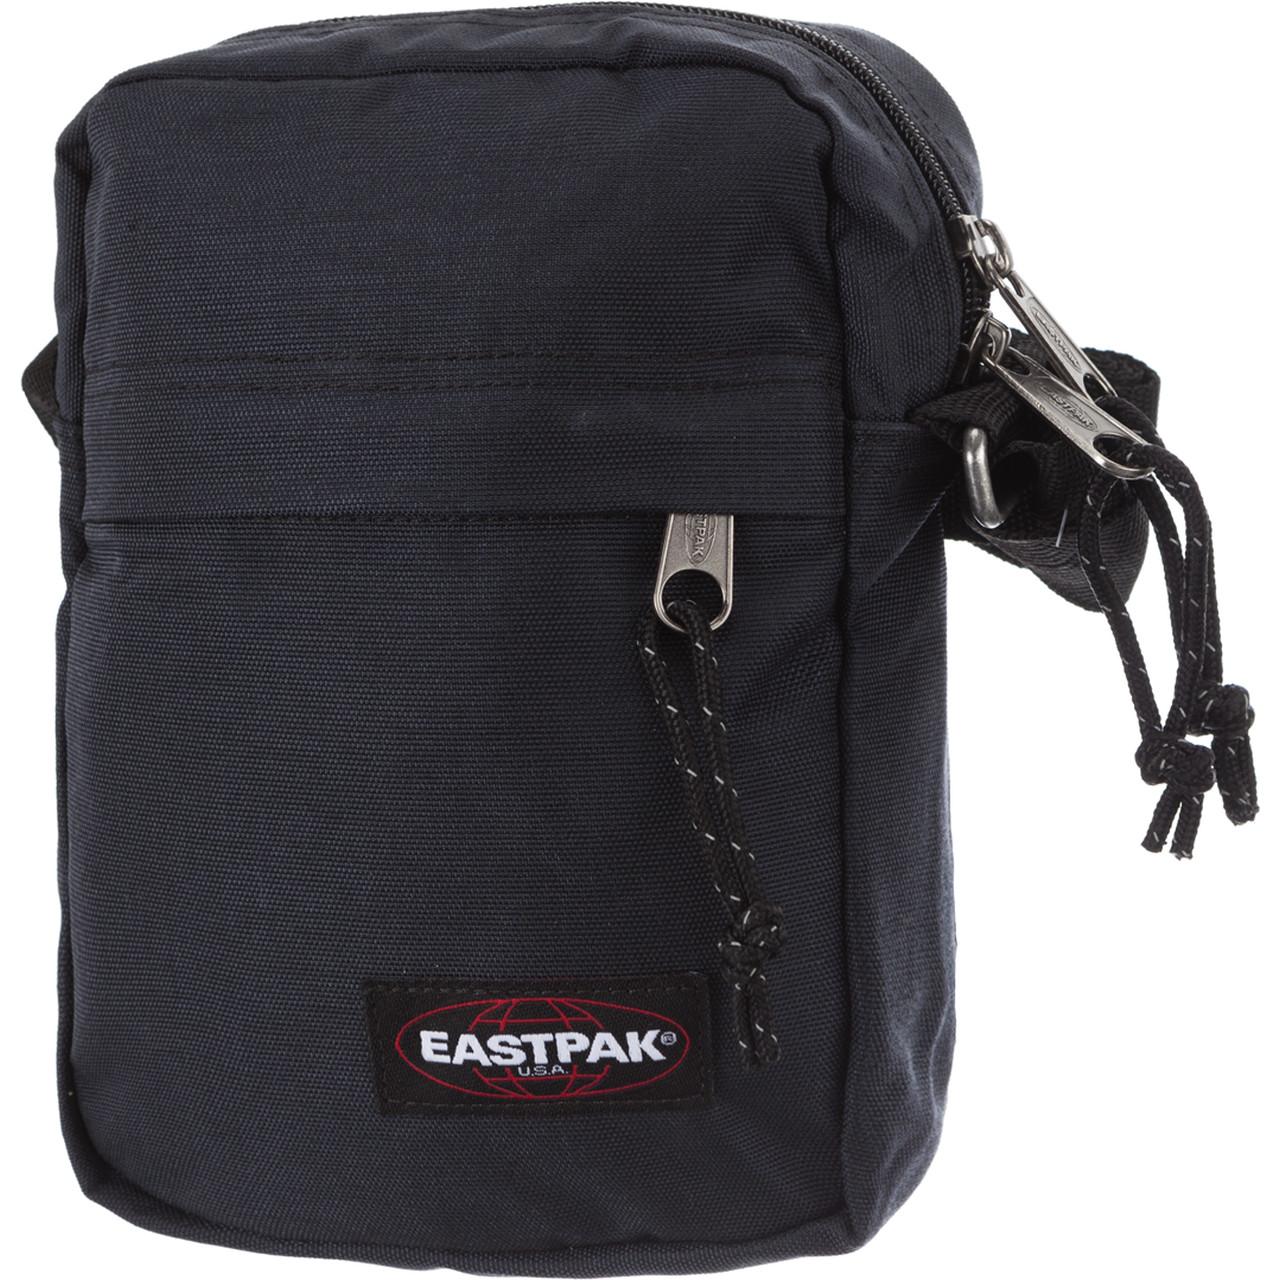 40d8939614b3 Eastpak The One Unisex Oldal Táska Ek045154 Unisex Taska/oldal-taska ...